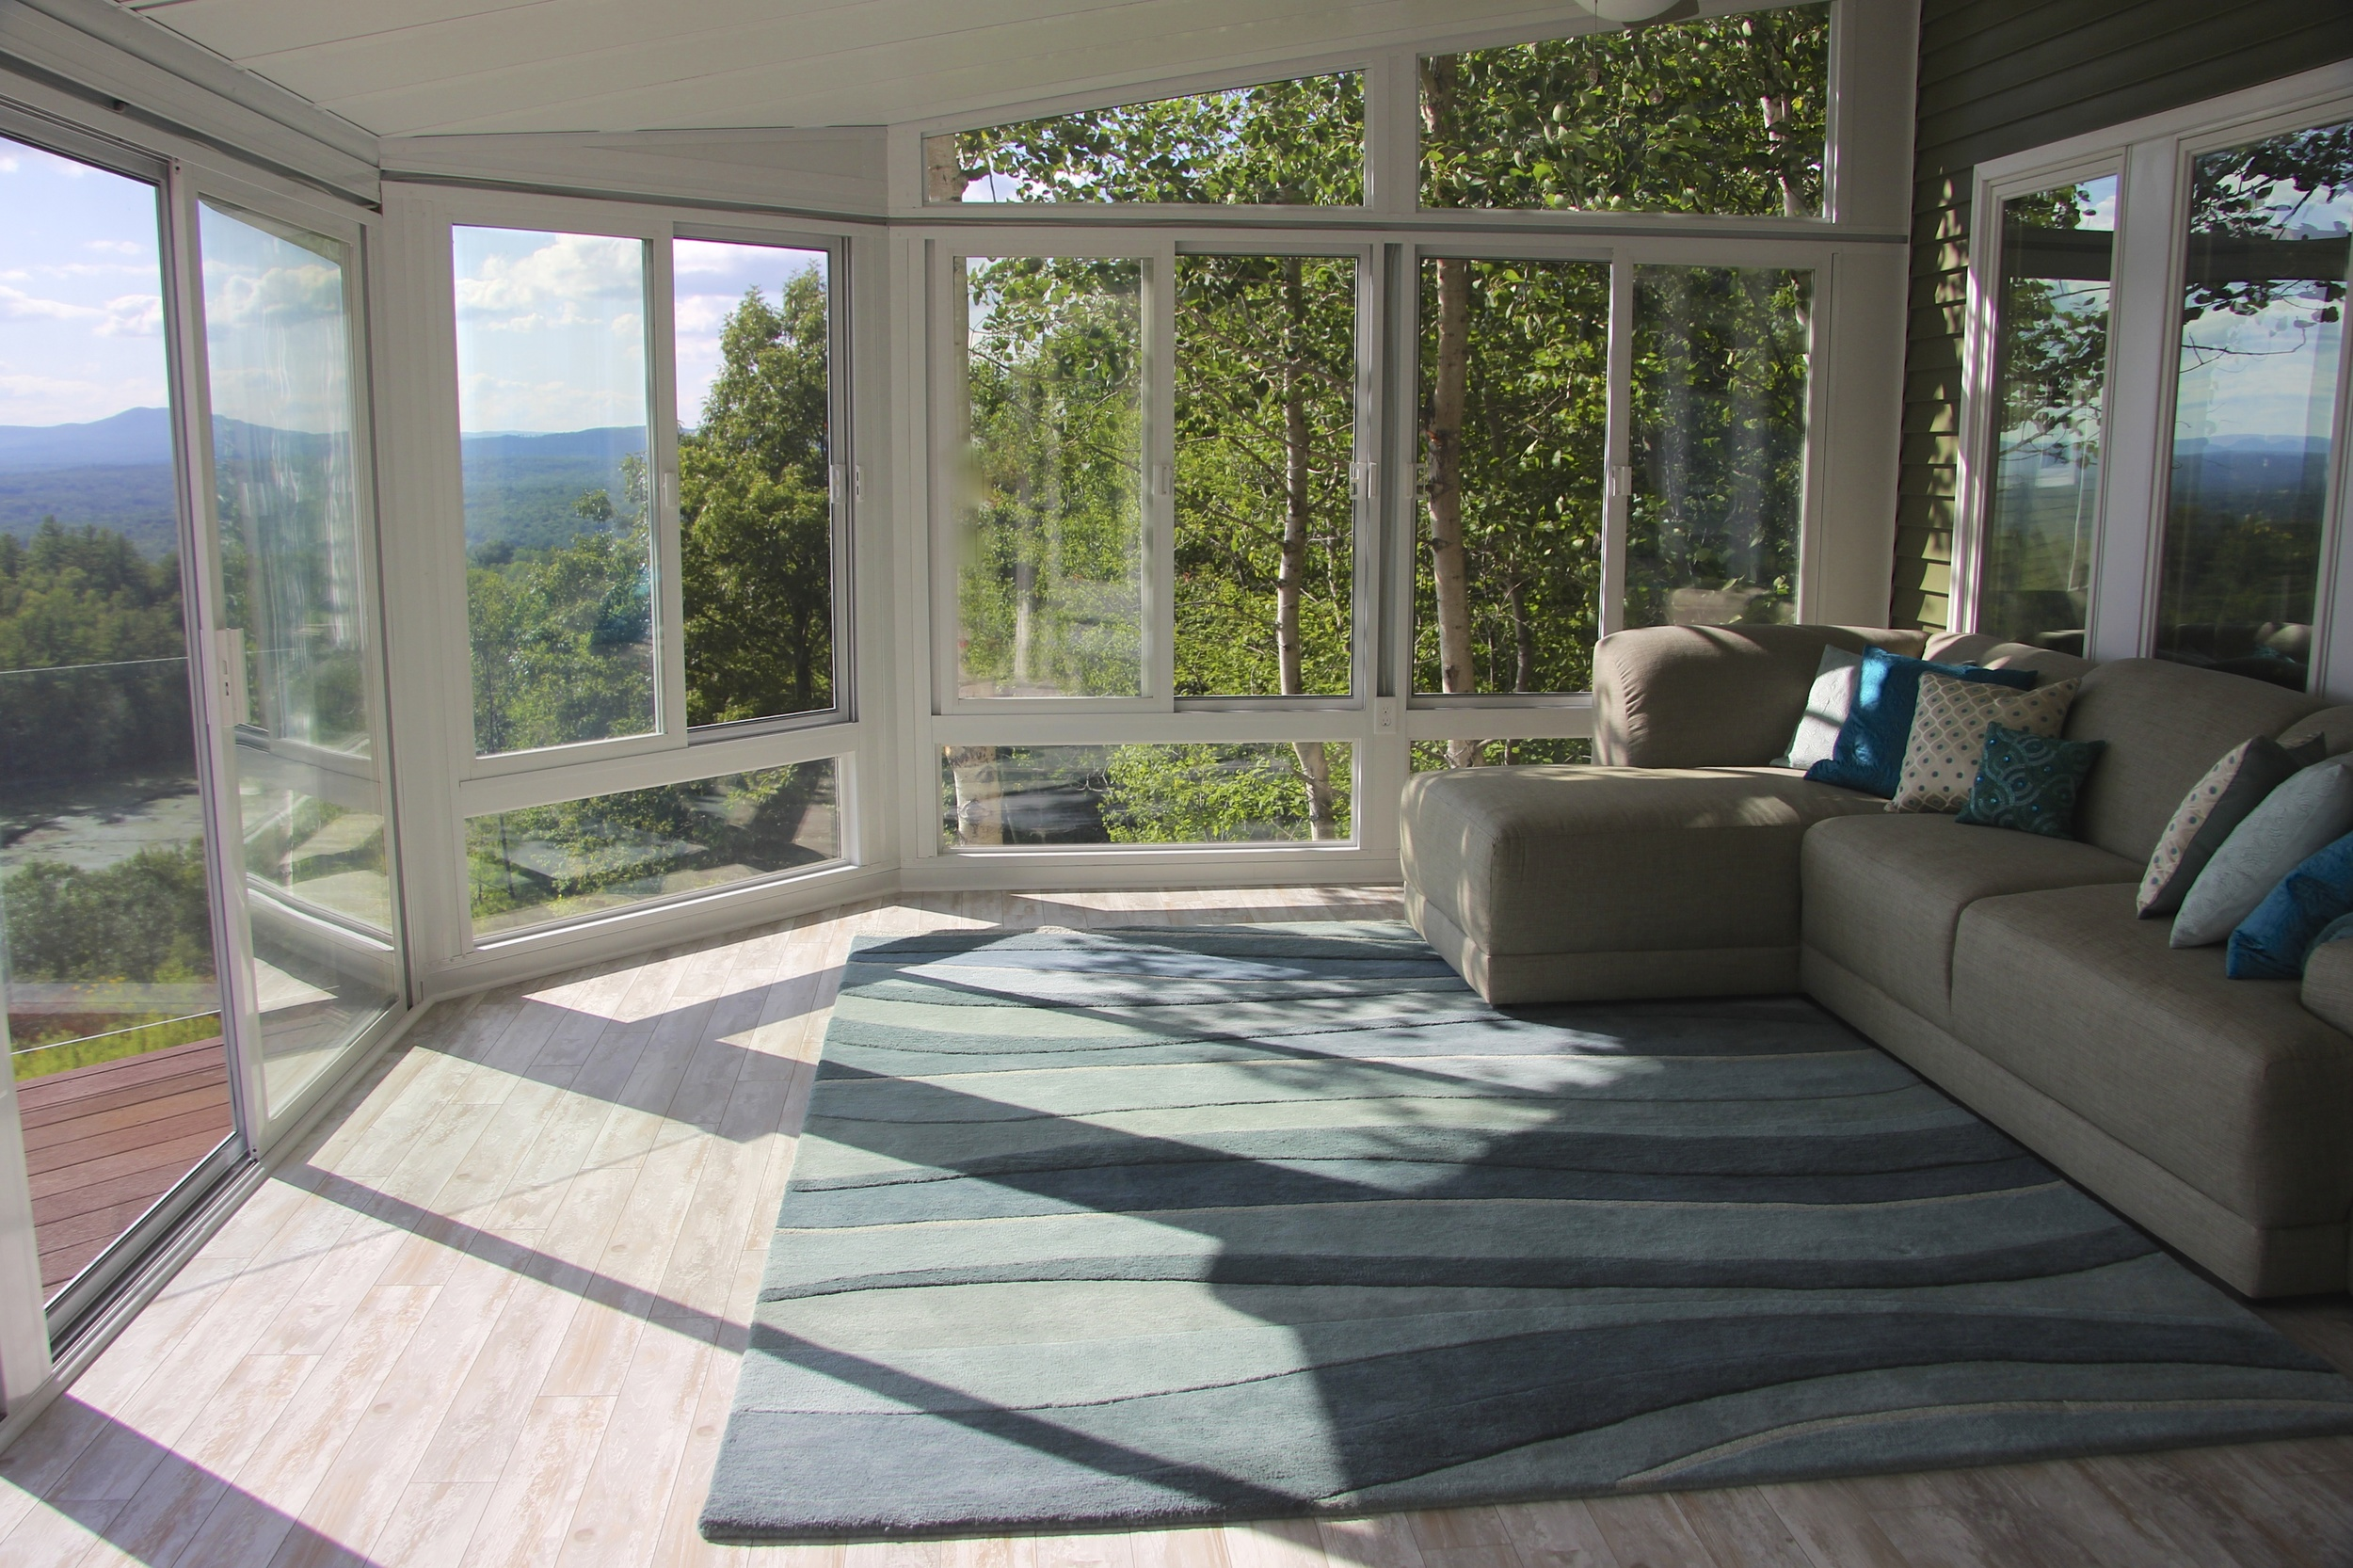 sunroom interior view